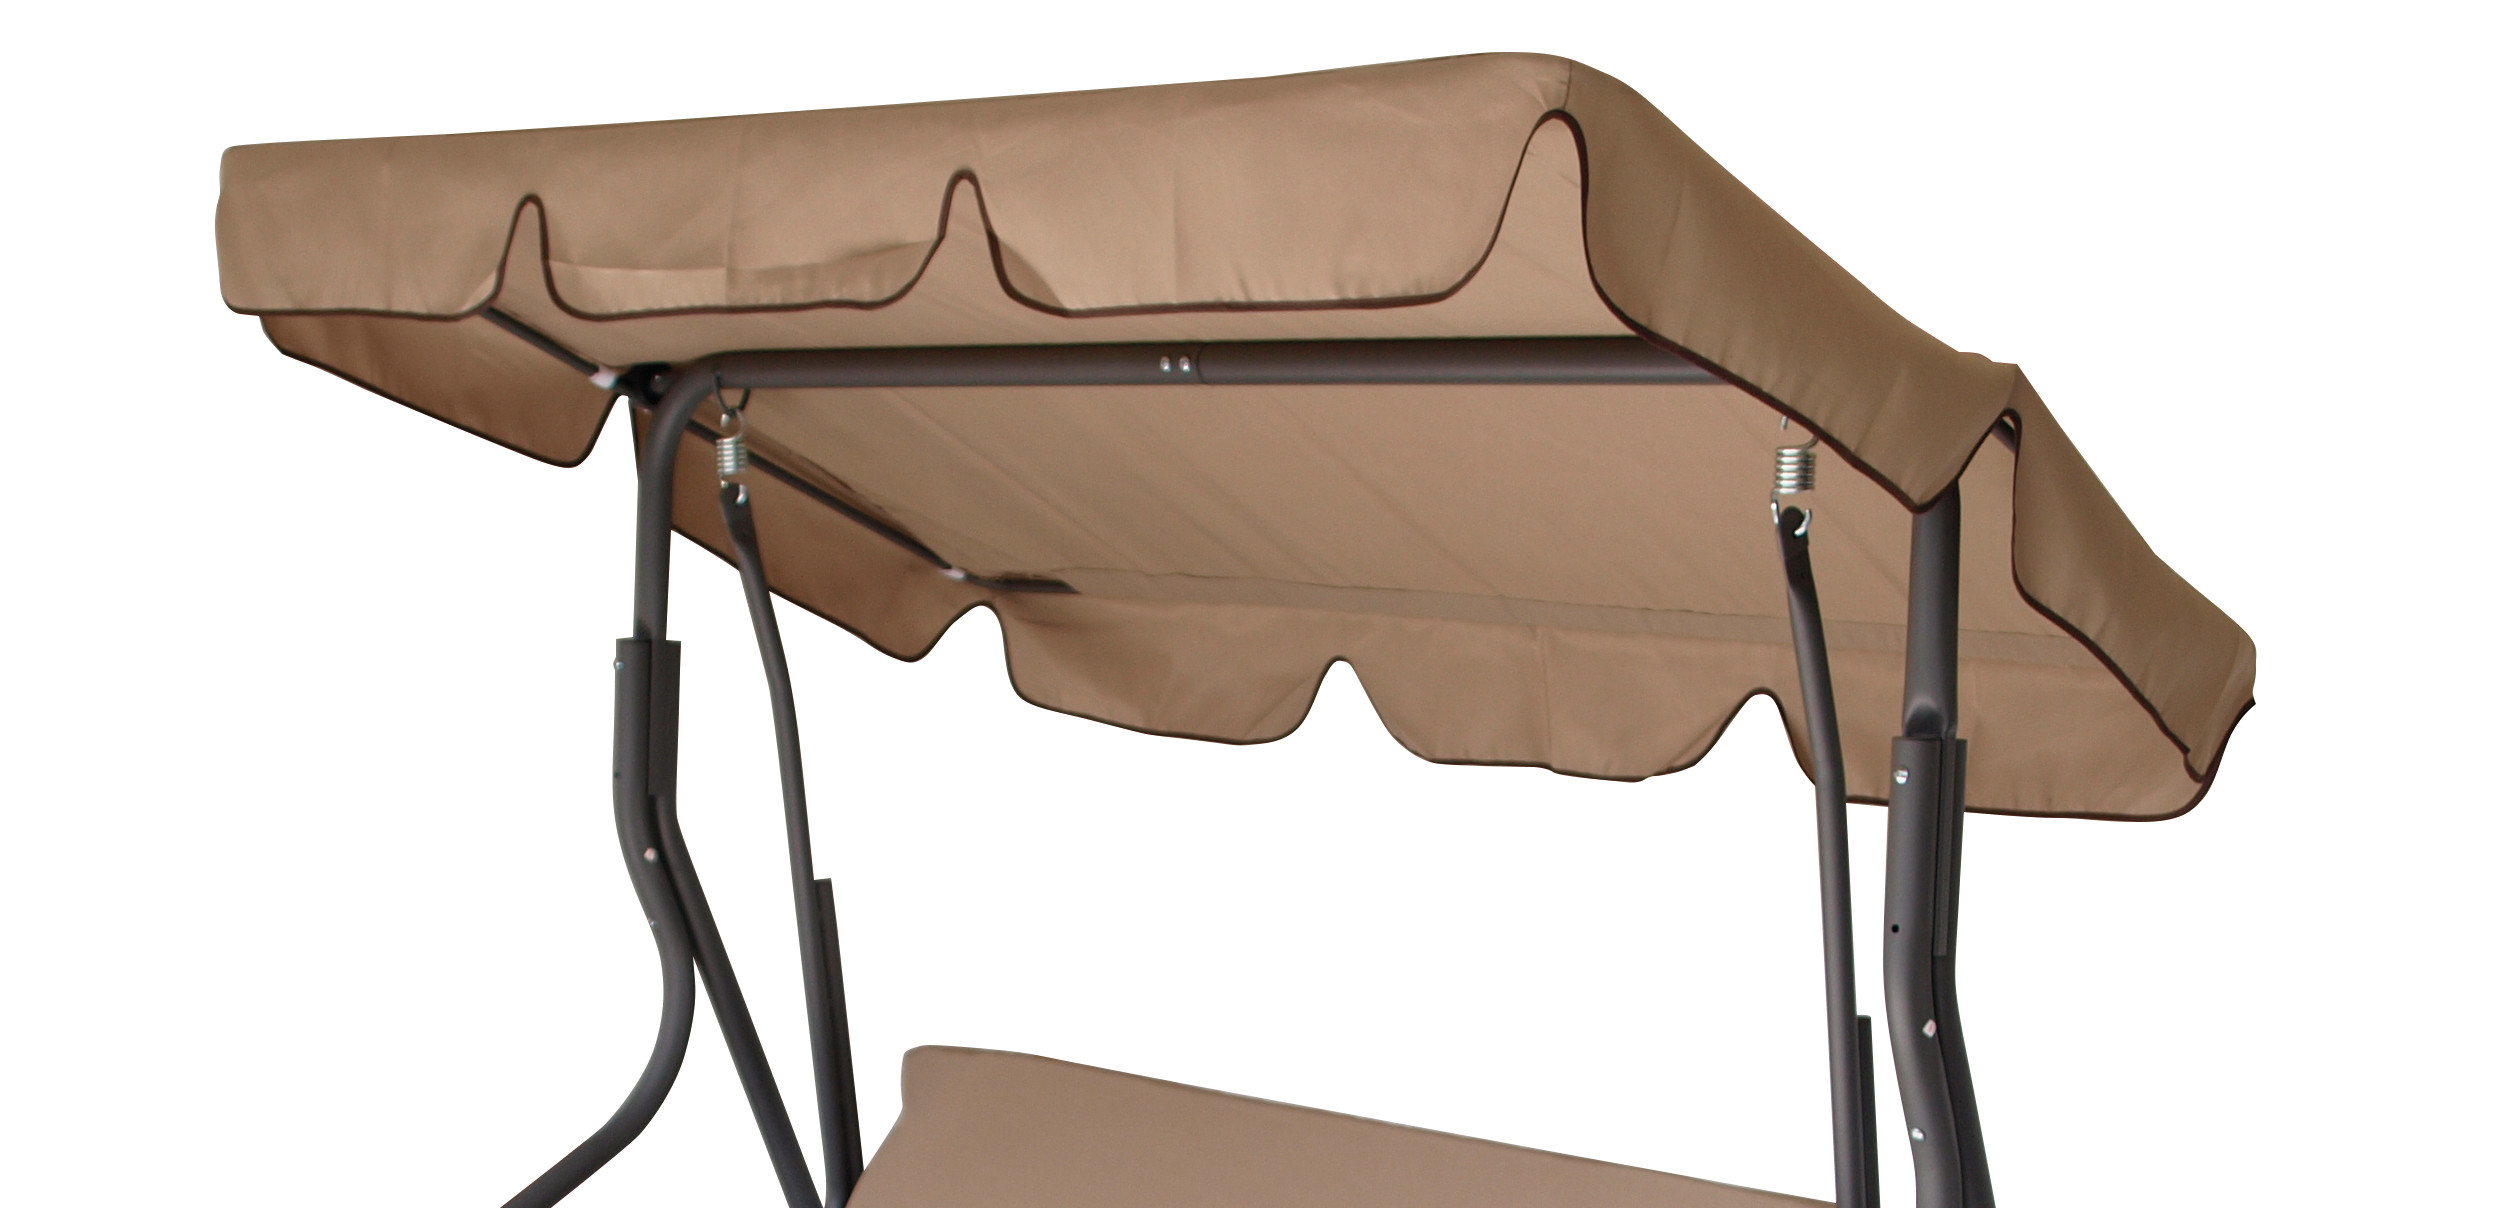 Dachplane für Hollywoodschauk FLORIDA 170x110cm, cremefarben